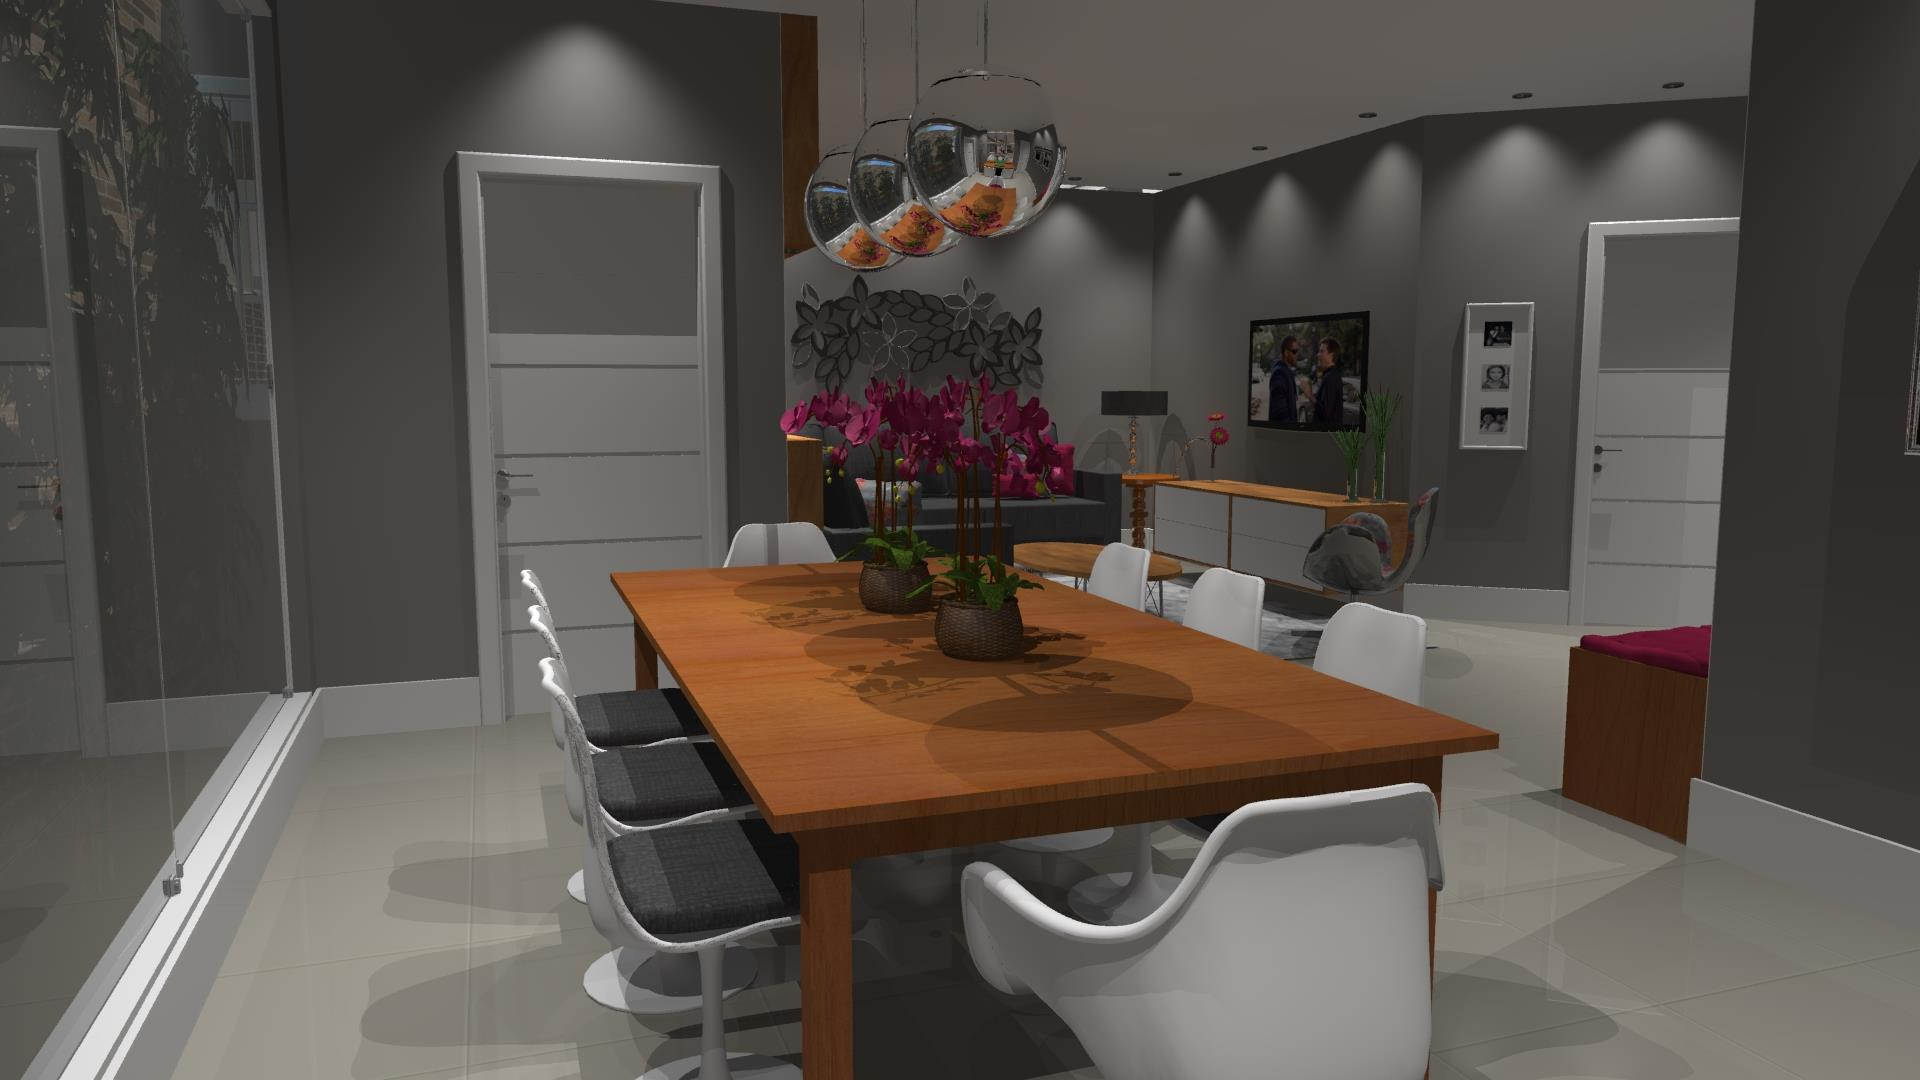 sala-de-jantar-decoracao